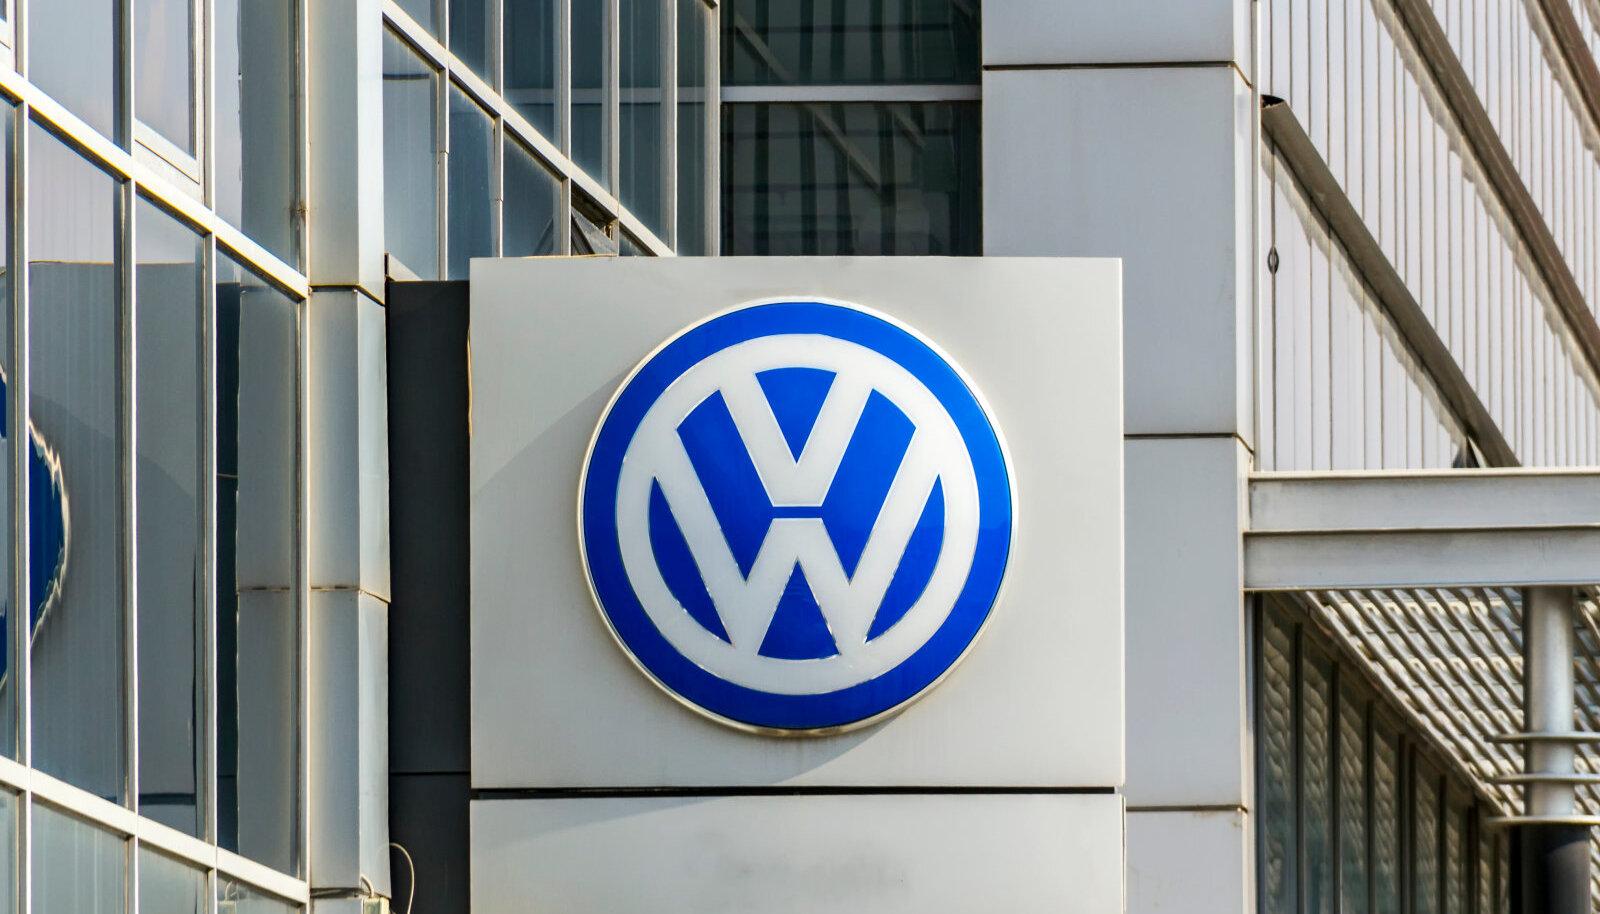 Volkswageni logo